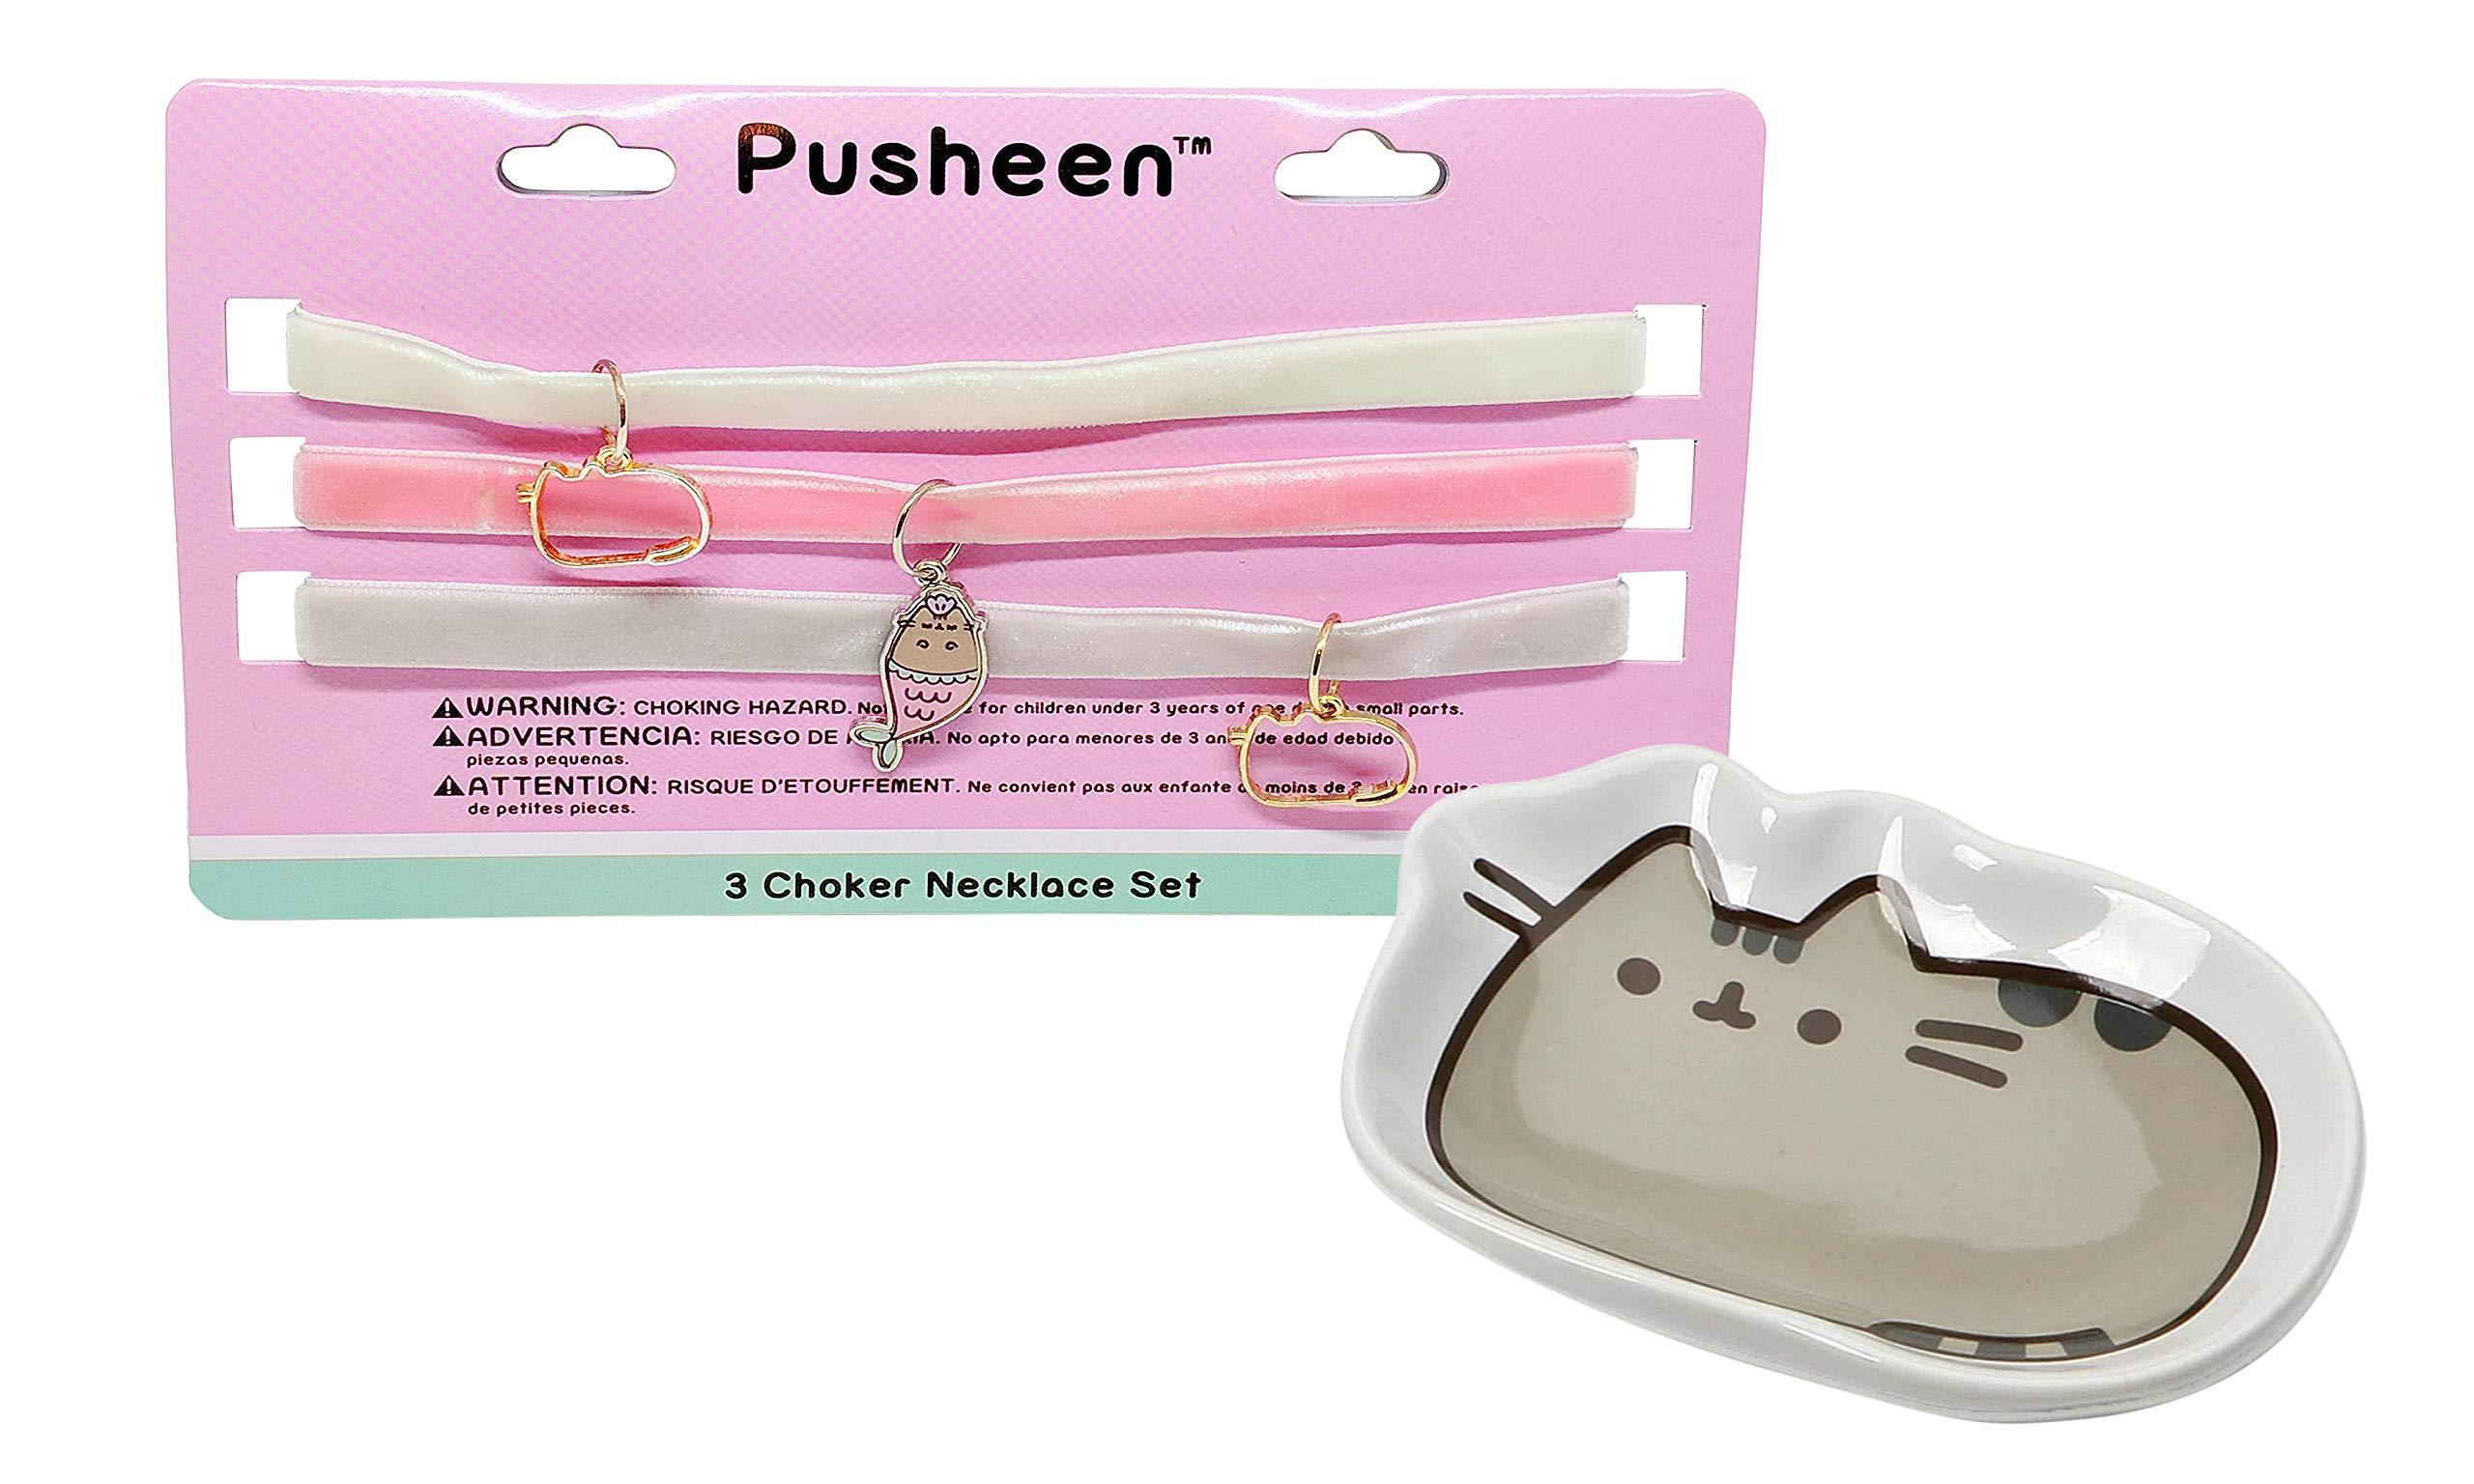 Pusheen Classic Tray Velvet Charm Choker Necklace Set